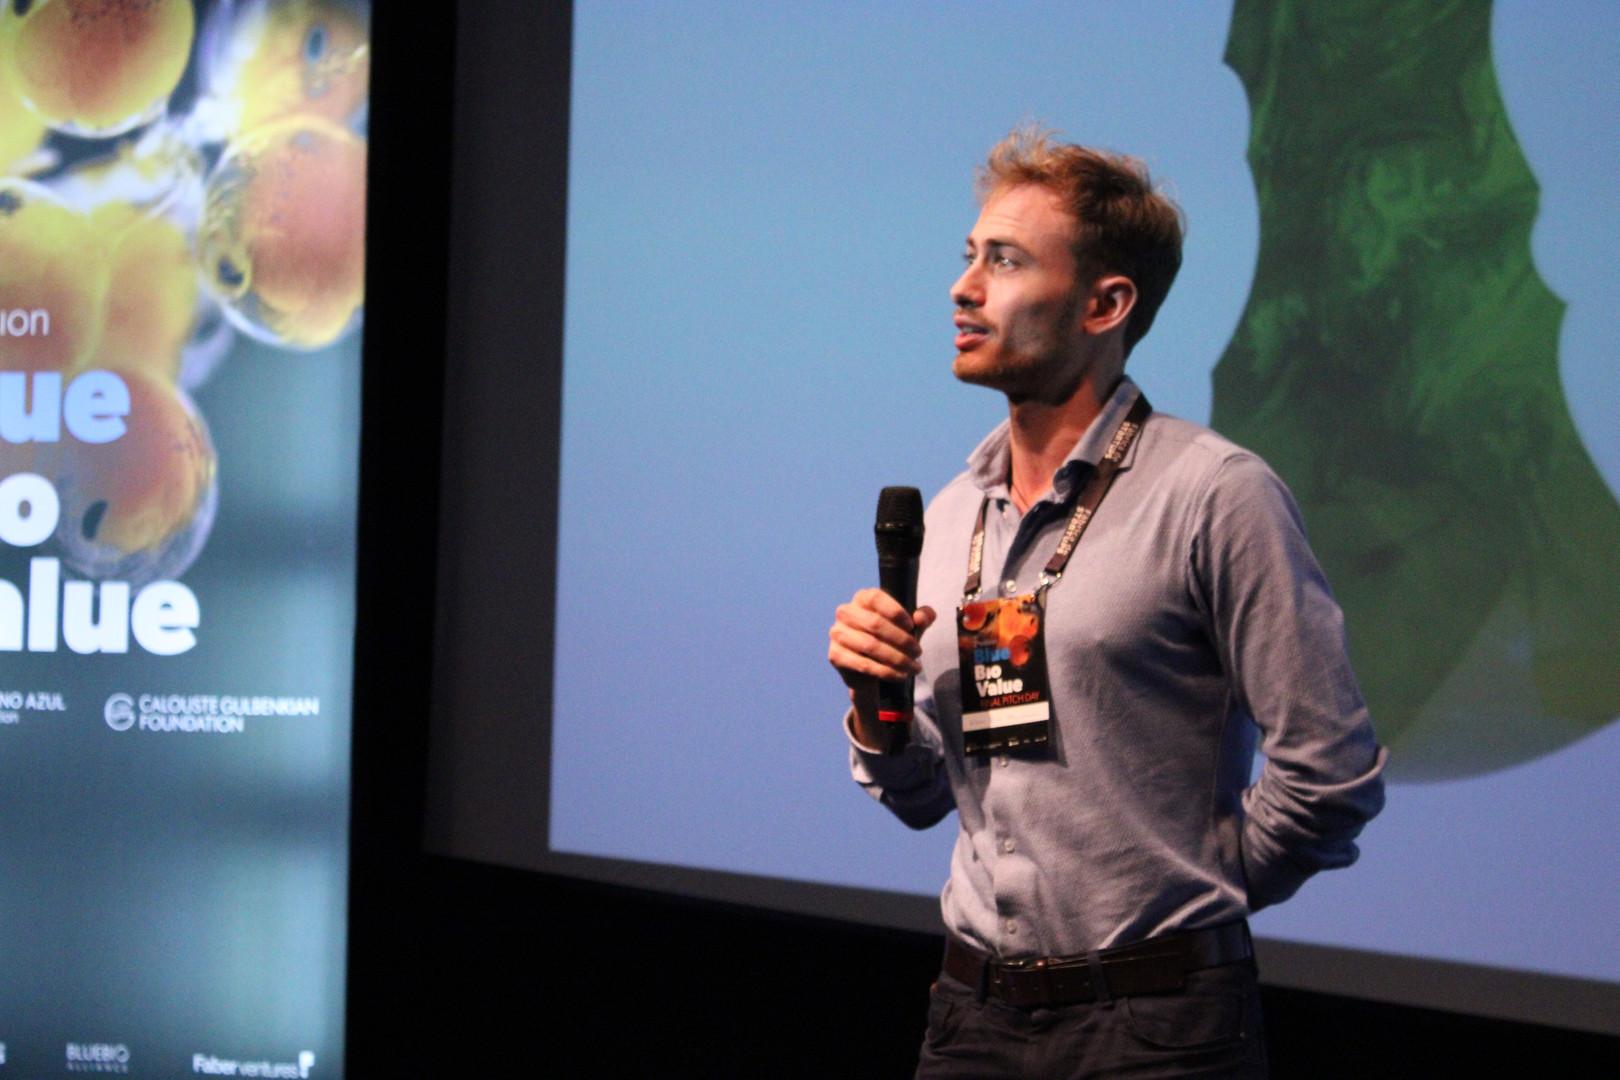 Esben Rimi Christiansen, Founder at Pure Algae Denmark.